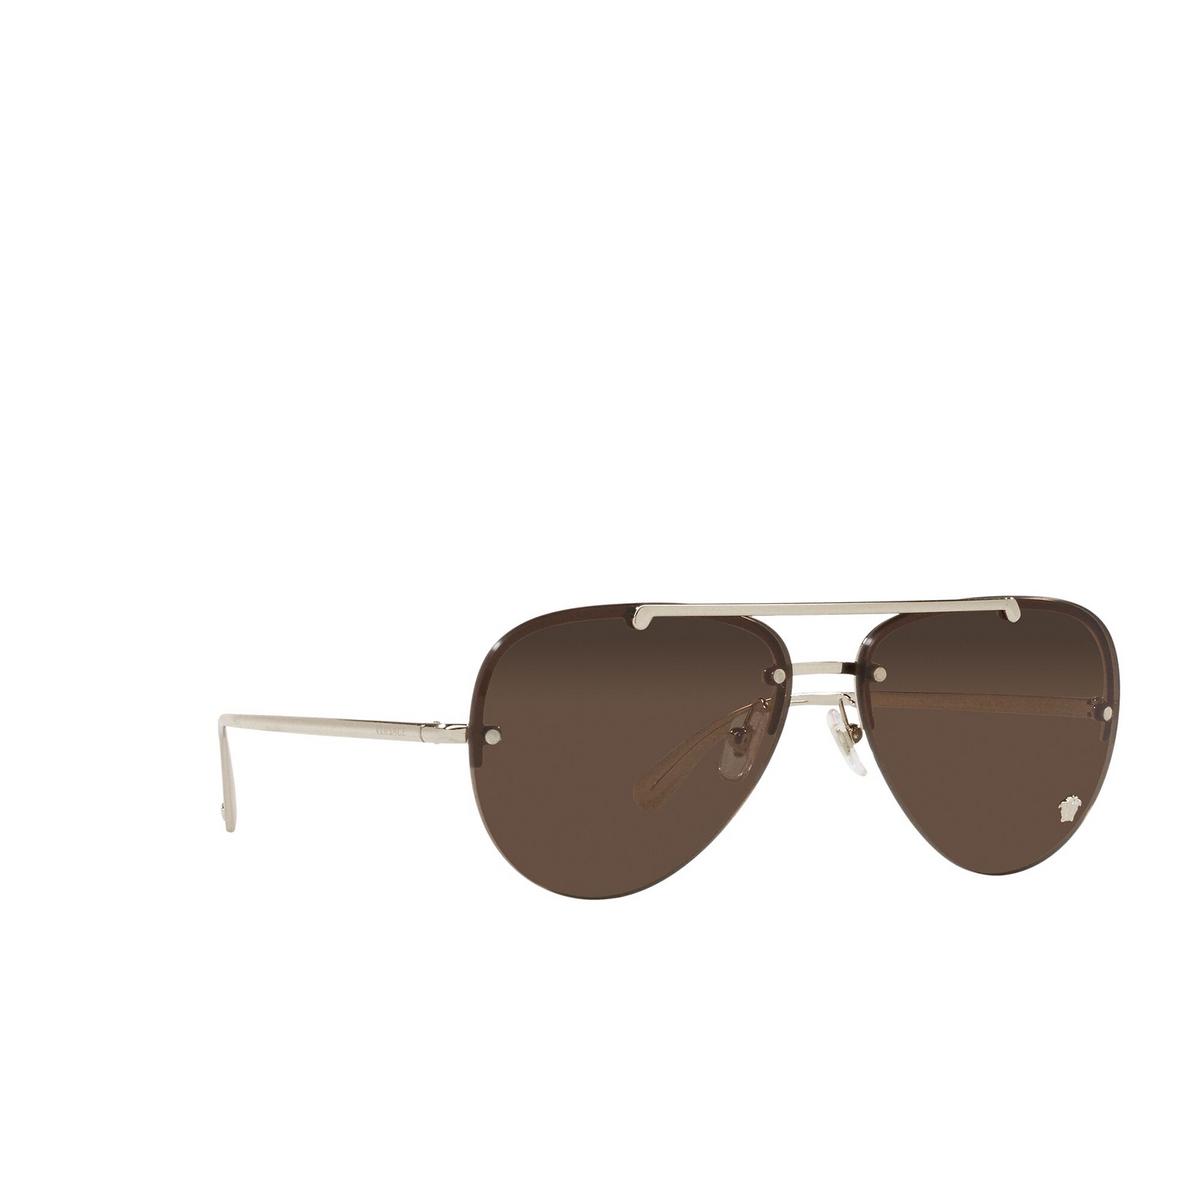 Versace® Aviator Sunglasses: VE2231 color Pale Gold 125273 - three-quarters view.